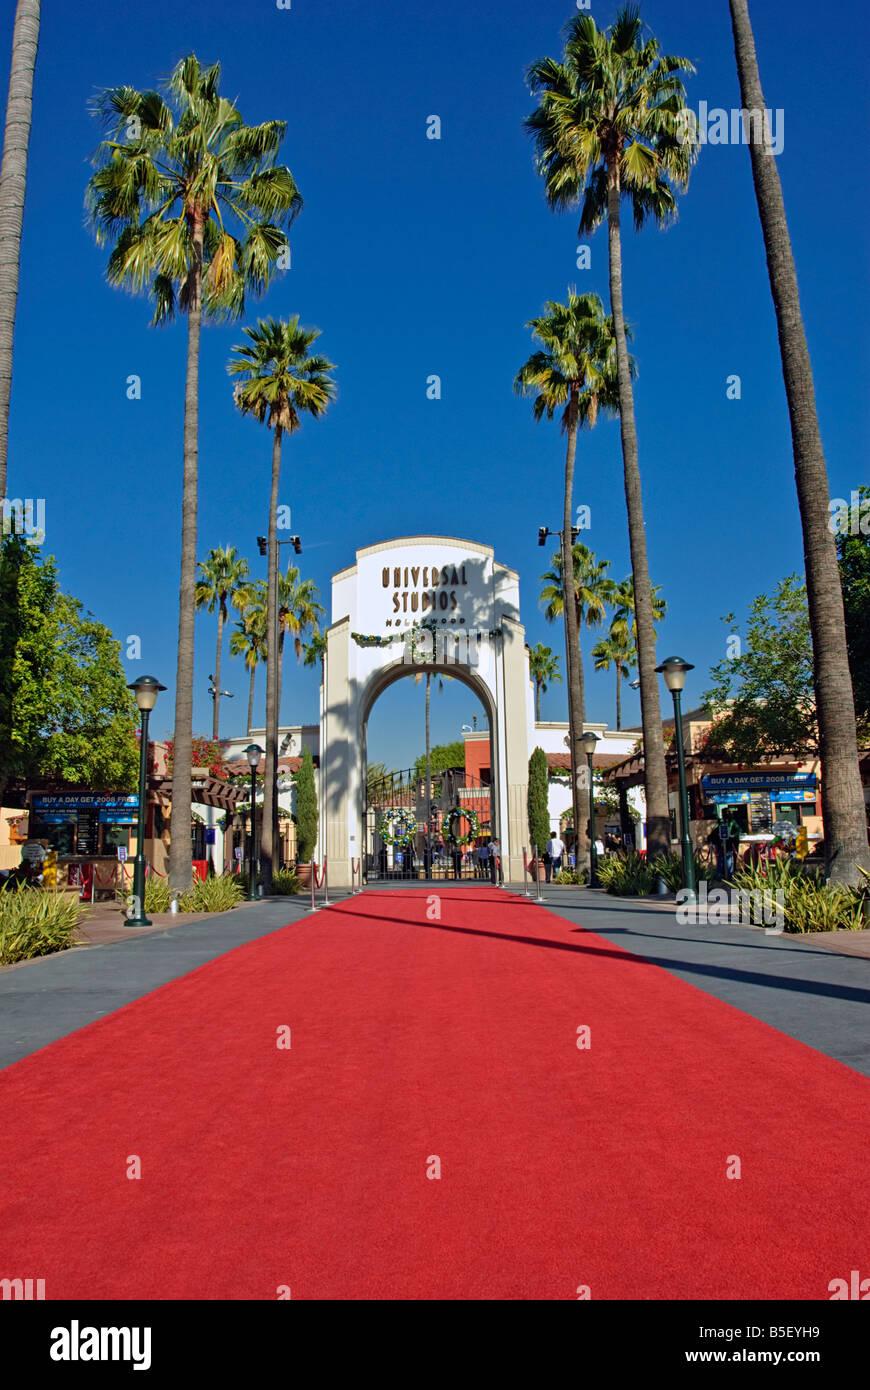 Universal Studios, LA, Hollywood, movie studio, Universal City, Universal Studios LA, CA, theme park, California, - Stock Image